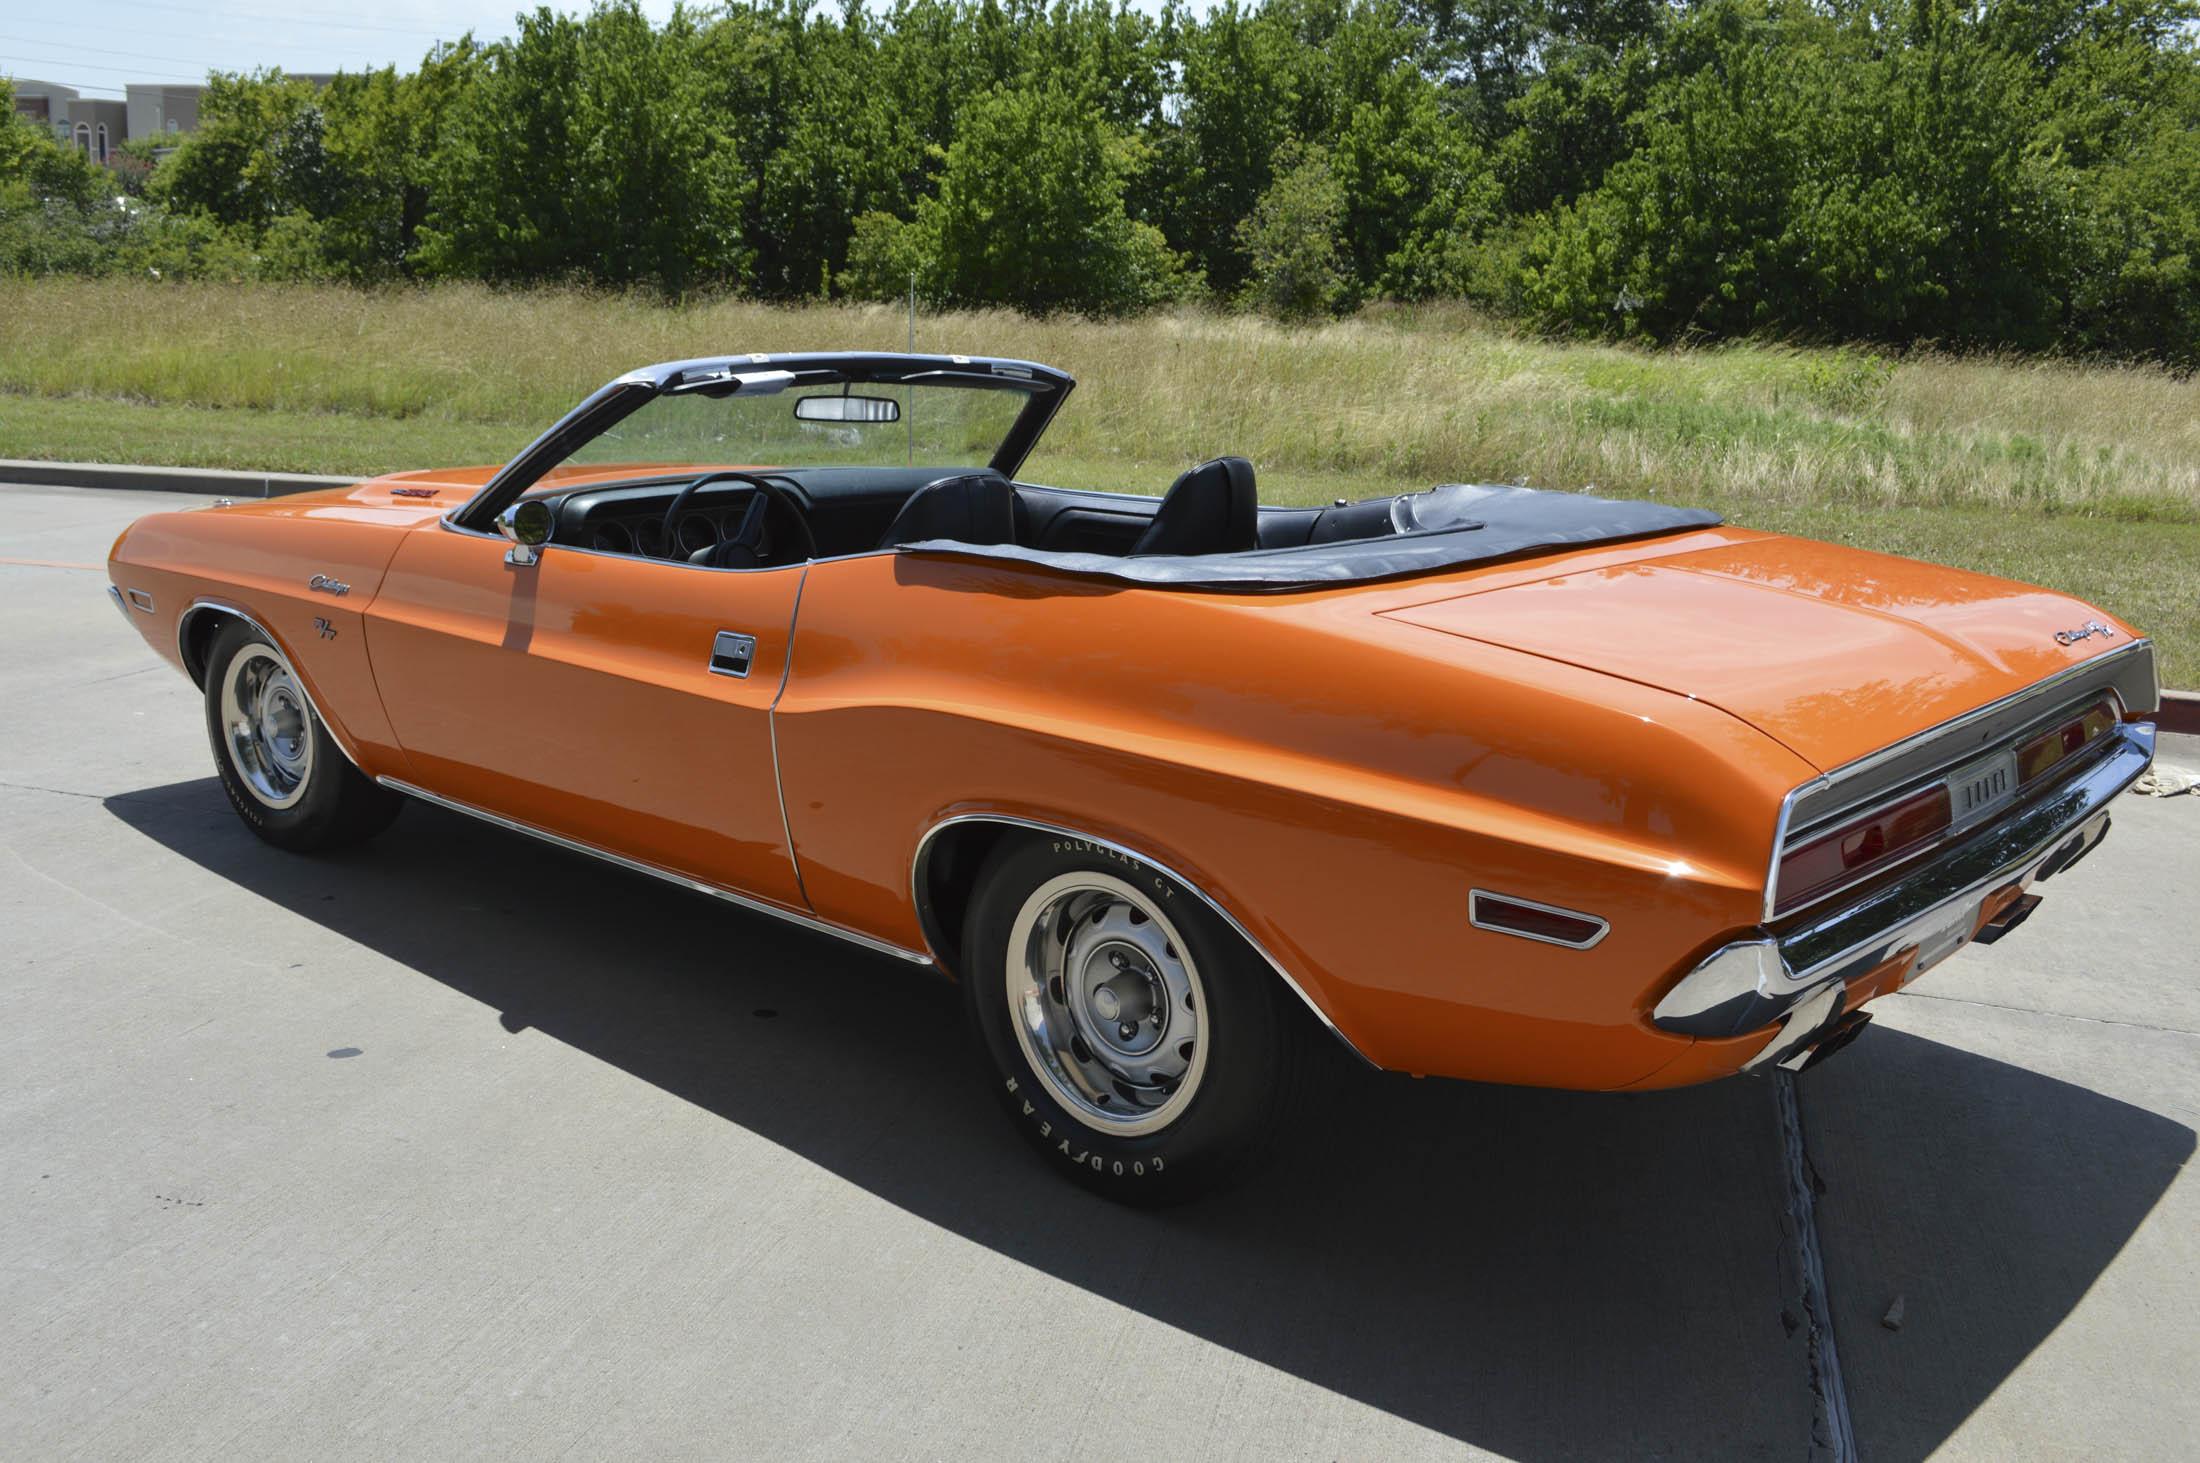 1970 Dodge Challenger R/T SE Convertible